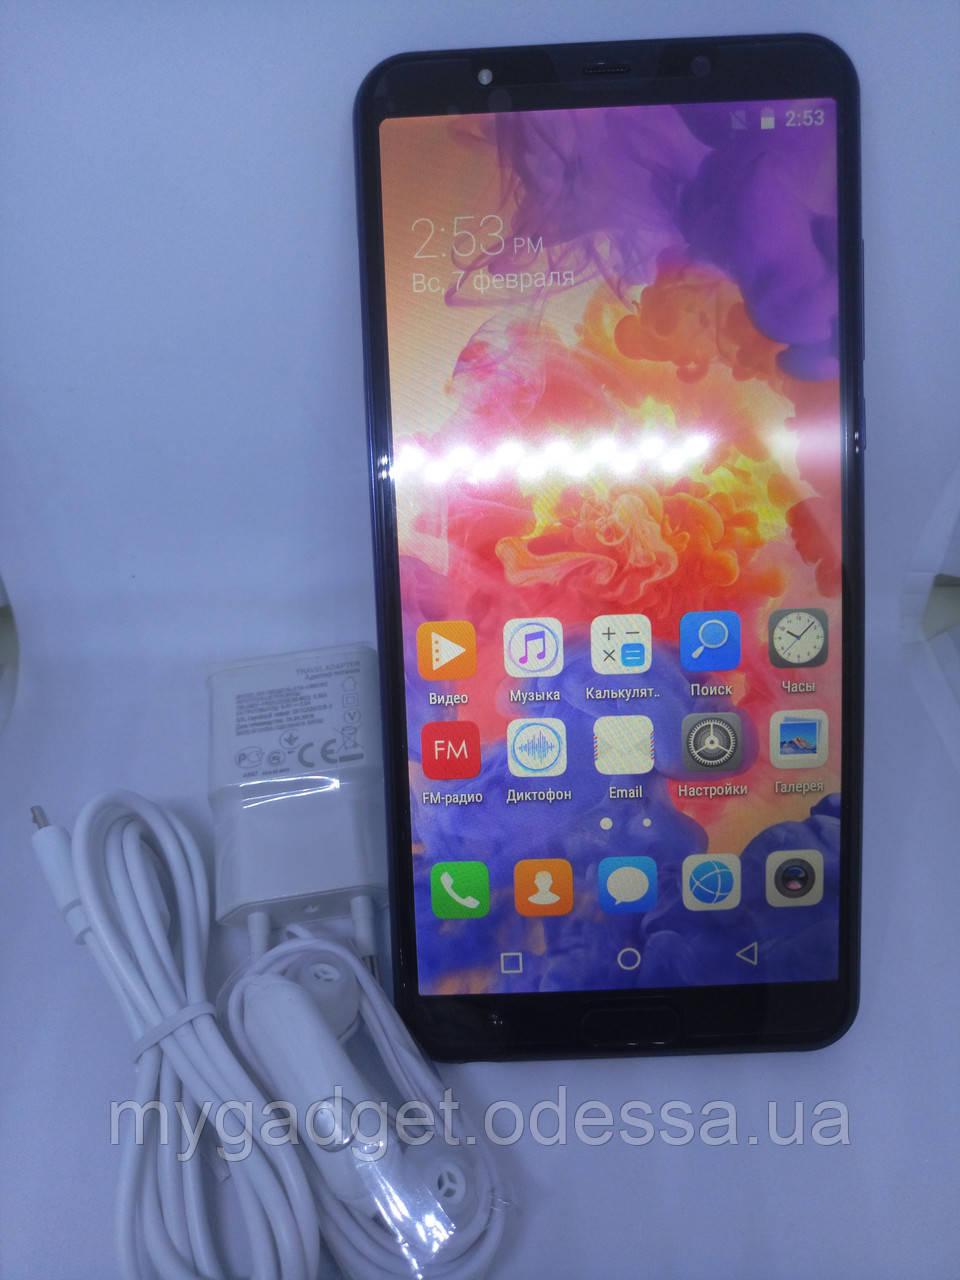 НОВИНКА! Корейская копия Huawei P20 Pro 8 ЯДЕР/64GB/6.1'/ТРОЙНАЯ КАМЕРА